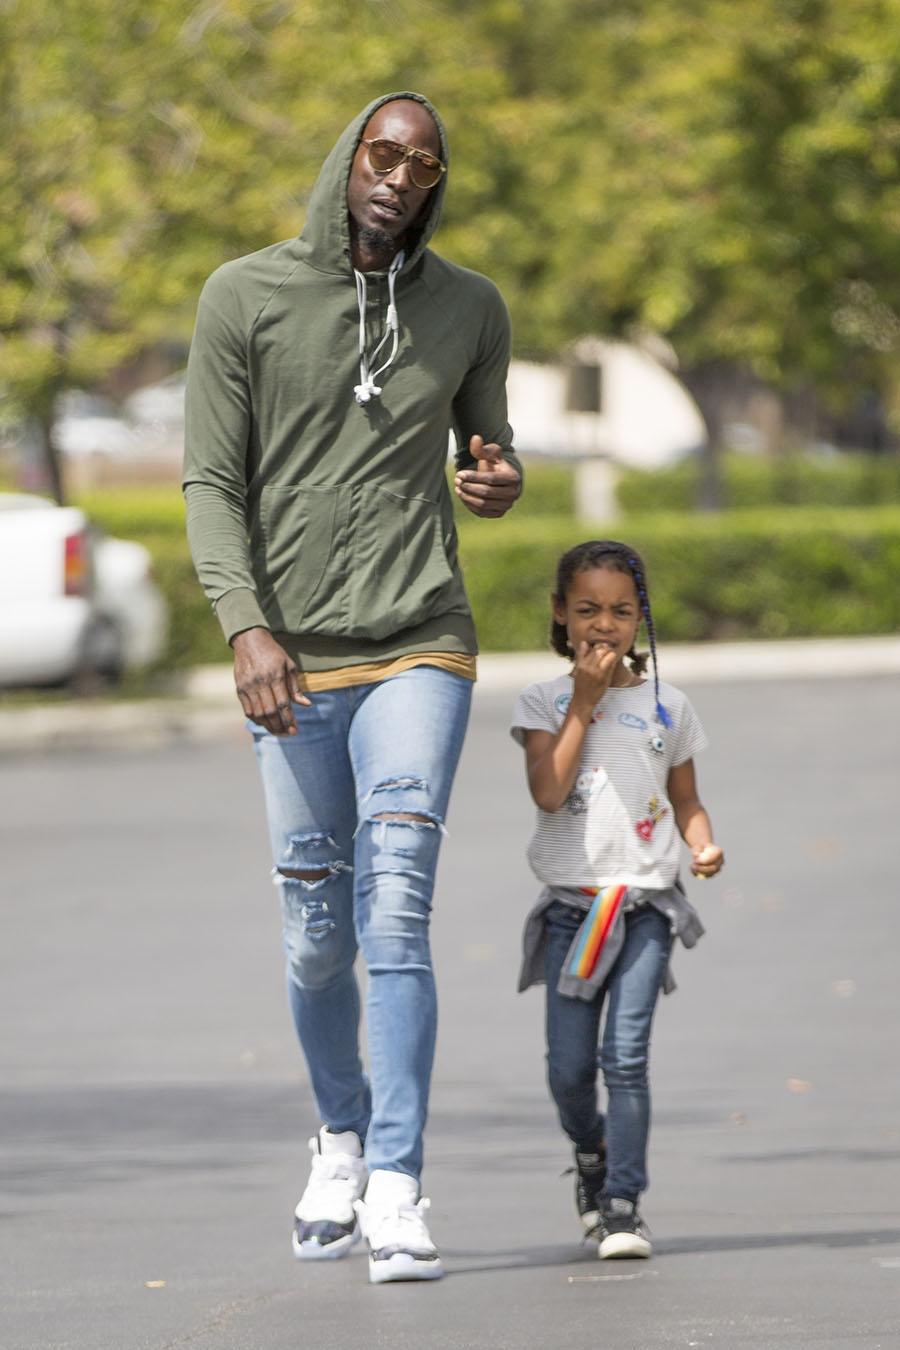 Nba Superstar Kevin Garnett Was Seen Taking His Adorable